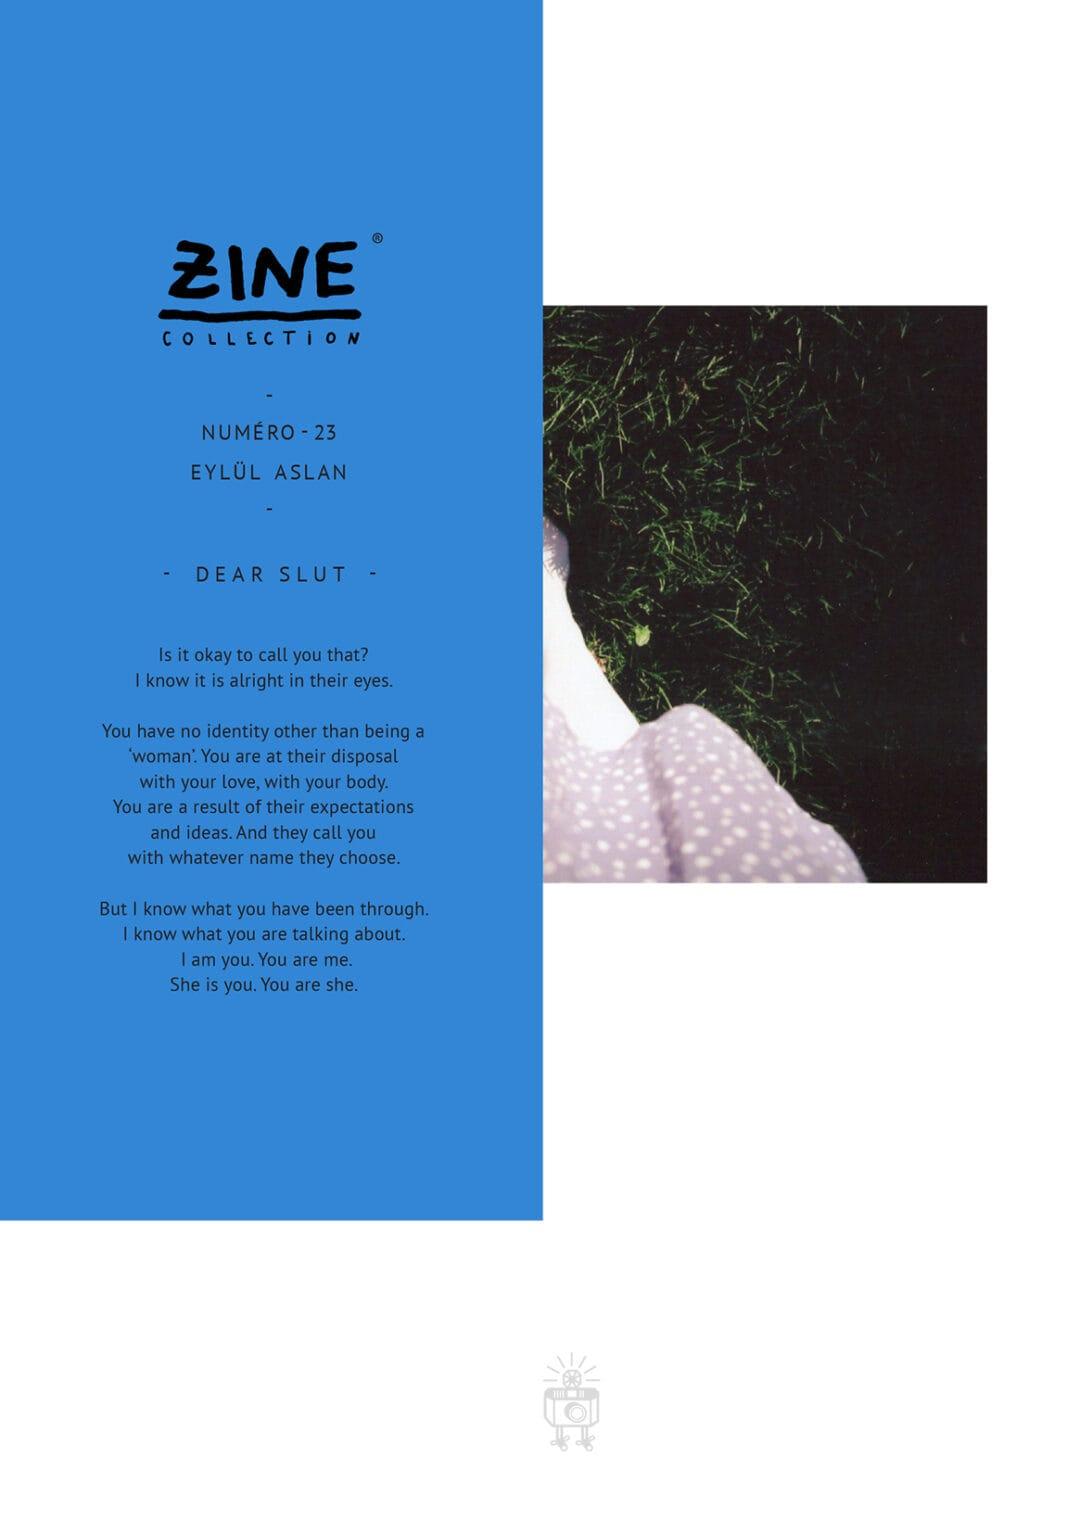 Dear Slut: Zine Collection #23 …